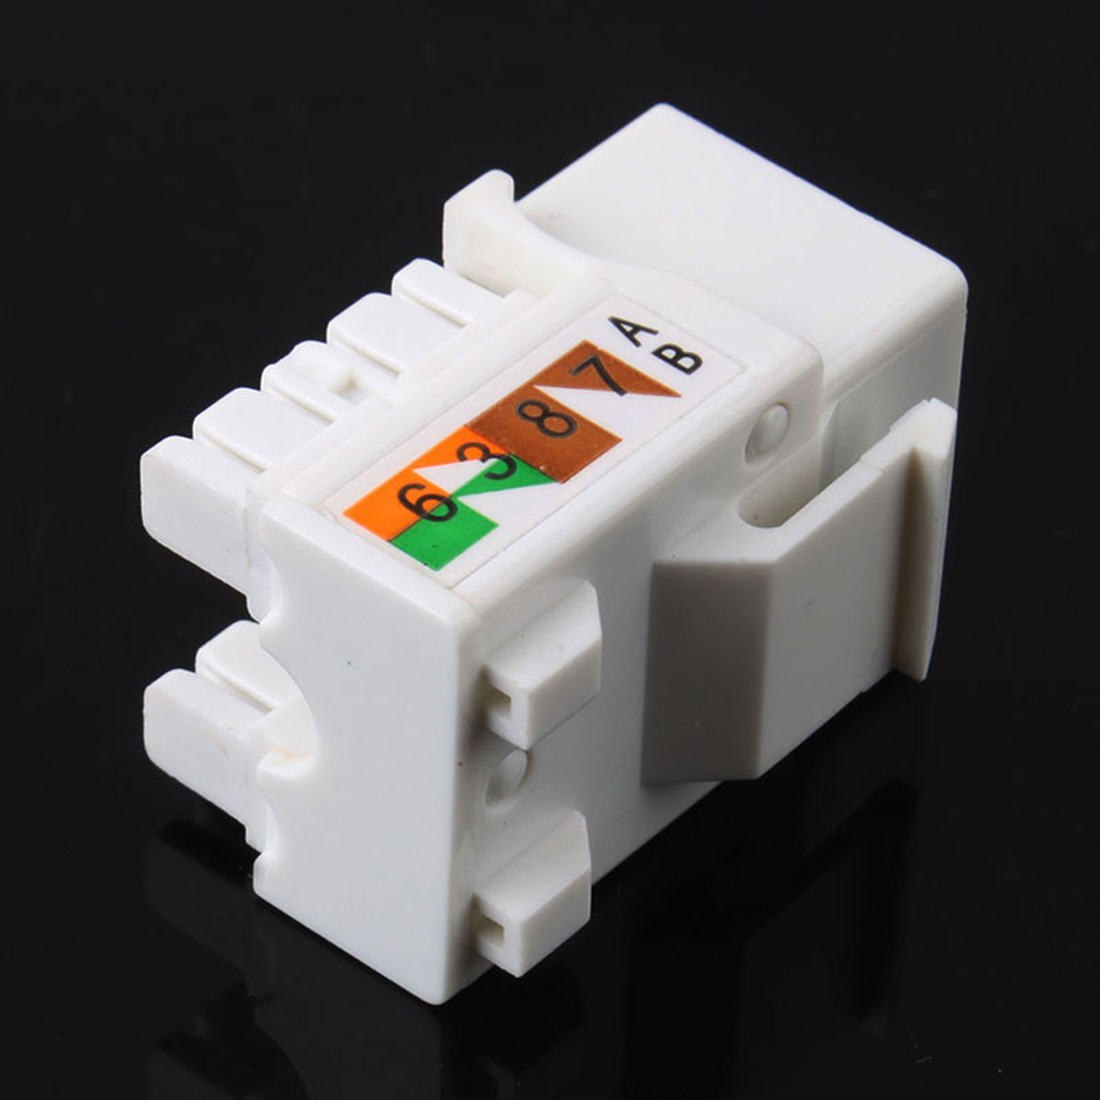 Marsnaska 5Pcs/lot CAT6 RJ45 110 Punch Down Keystone Network Ethernet Jack Top Quality 5pcs lot ti tps51117 51117 qfn step down controller